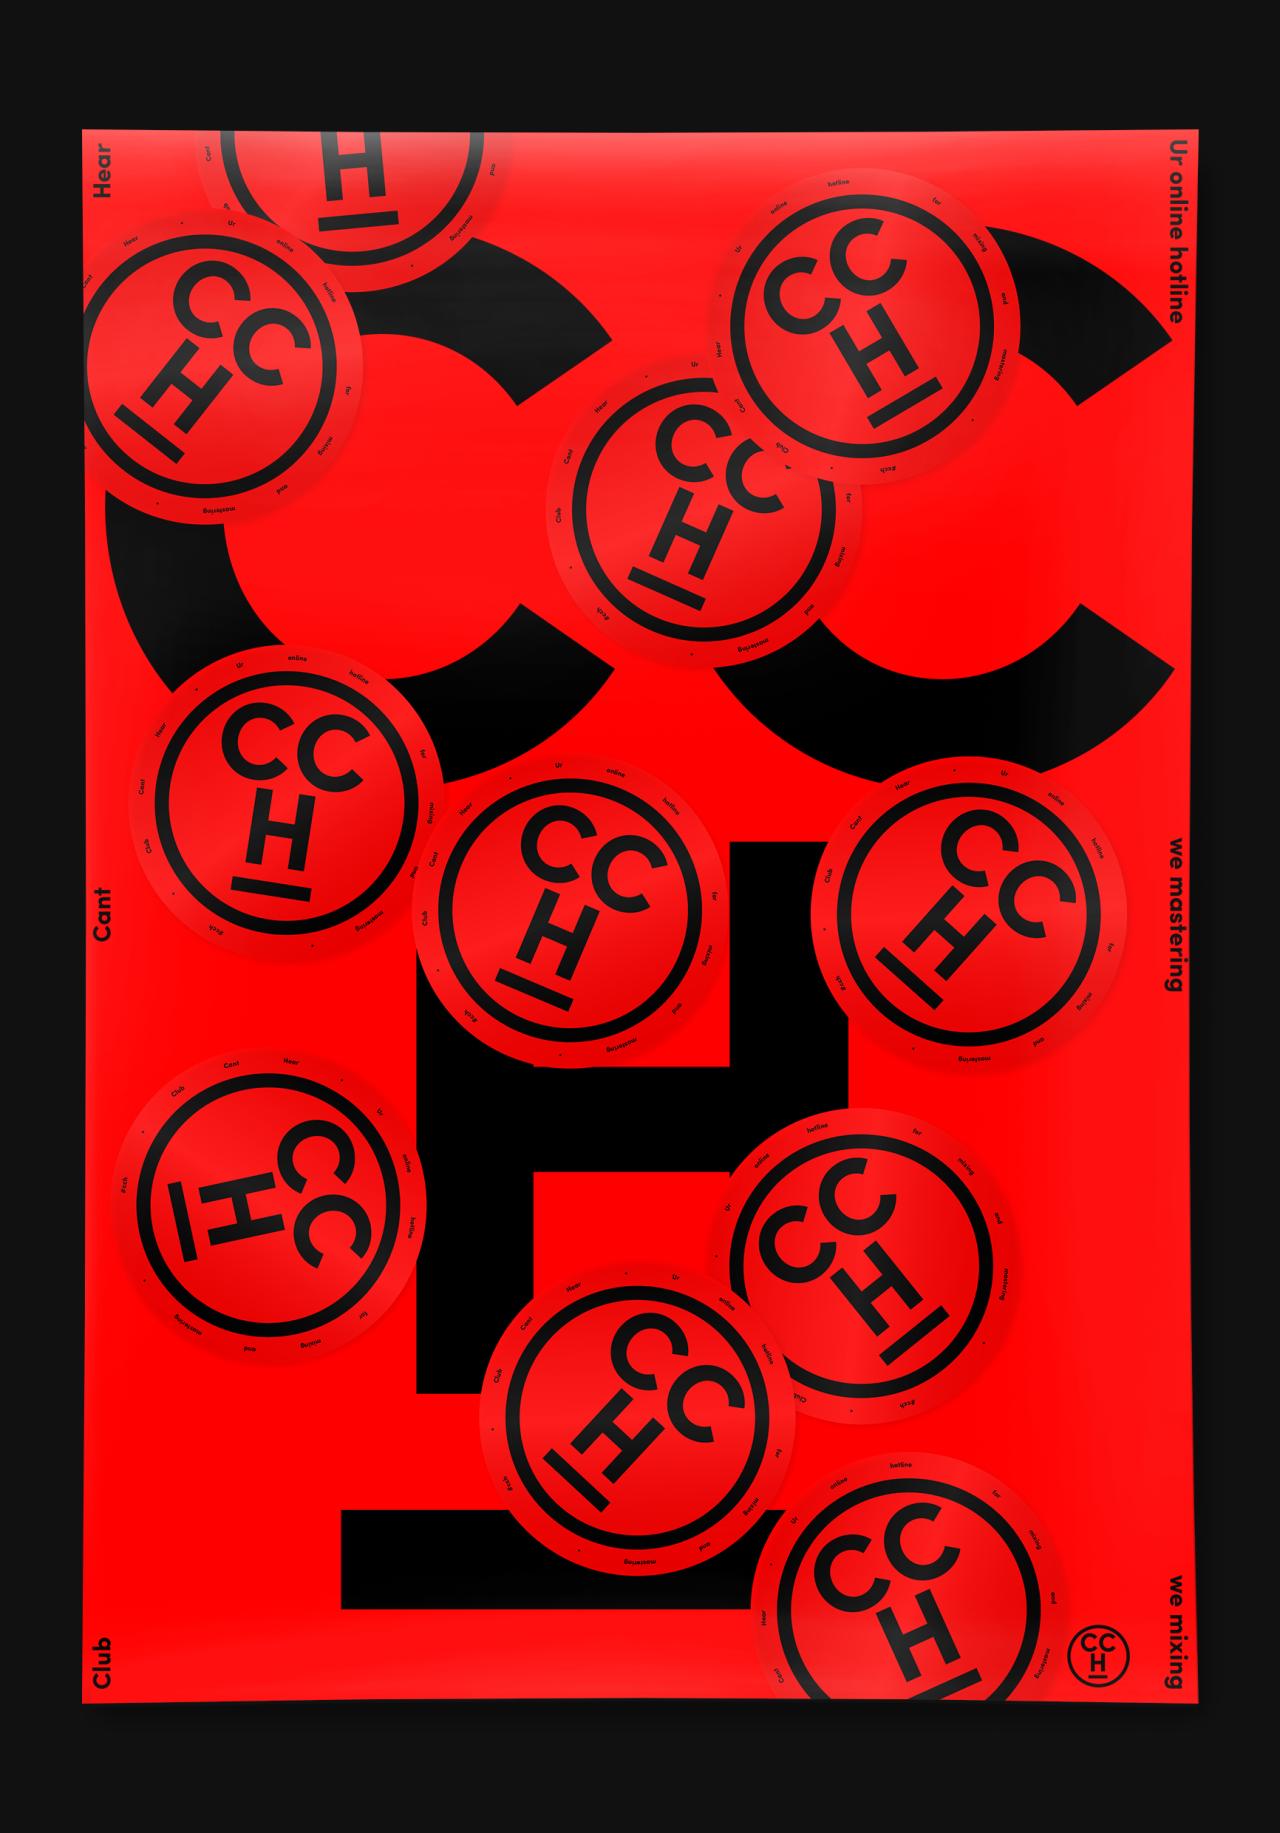 Club Cant Hear poster, Studio Jimbo 2016.